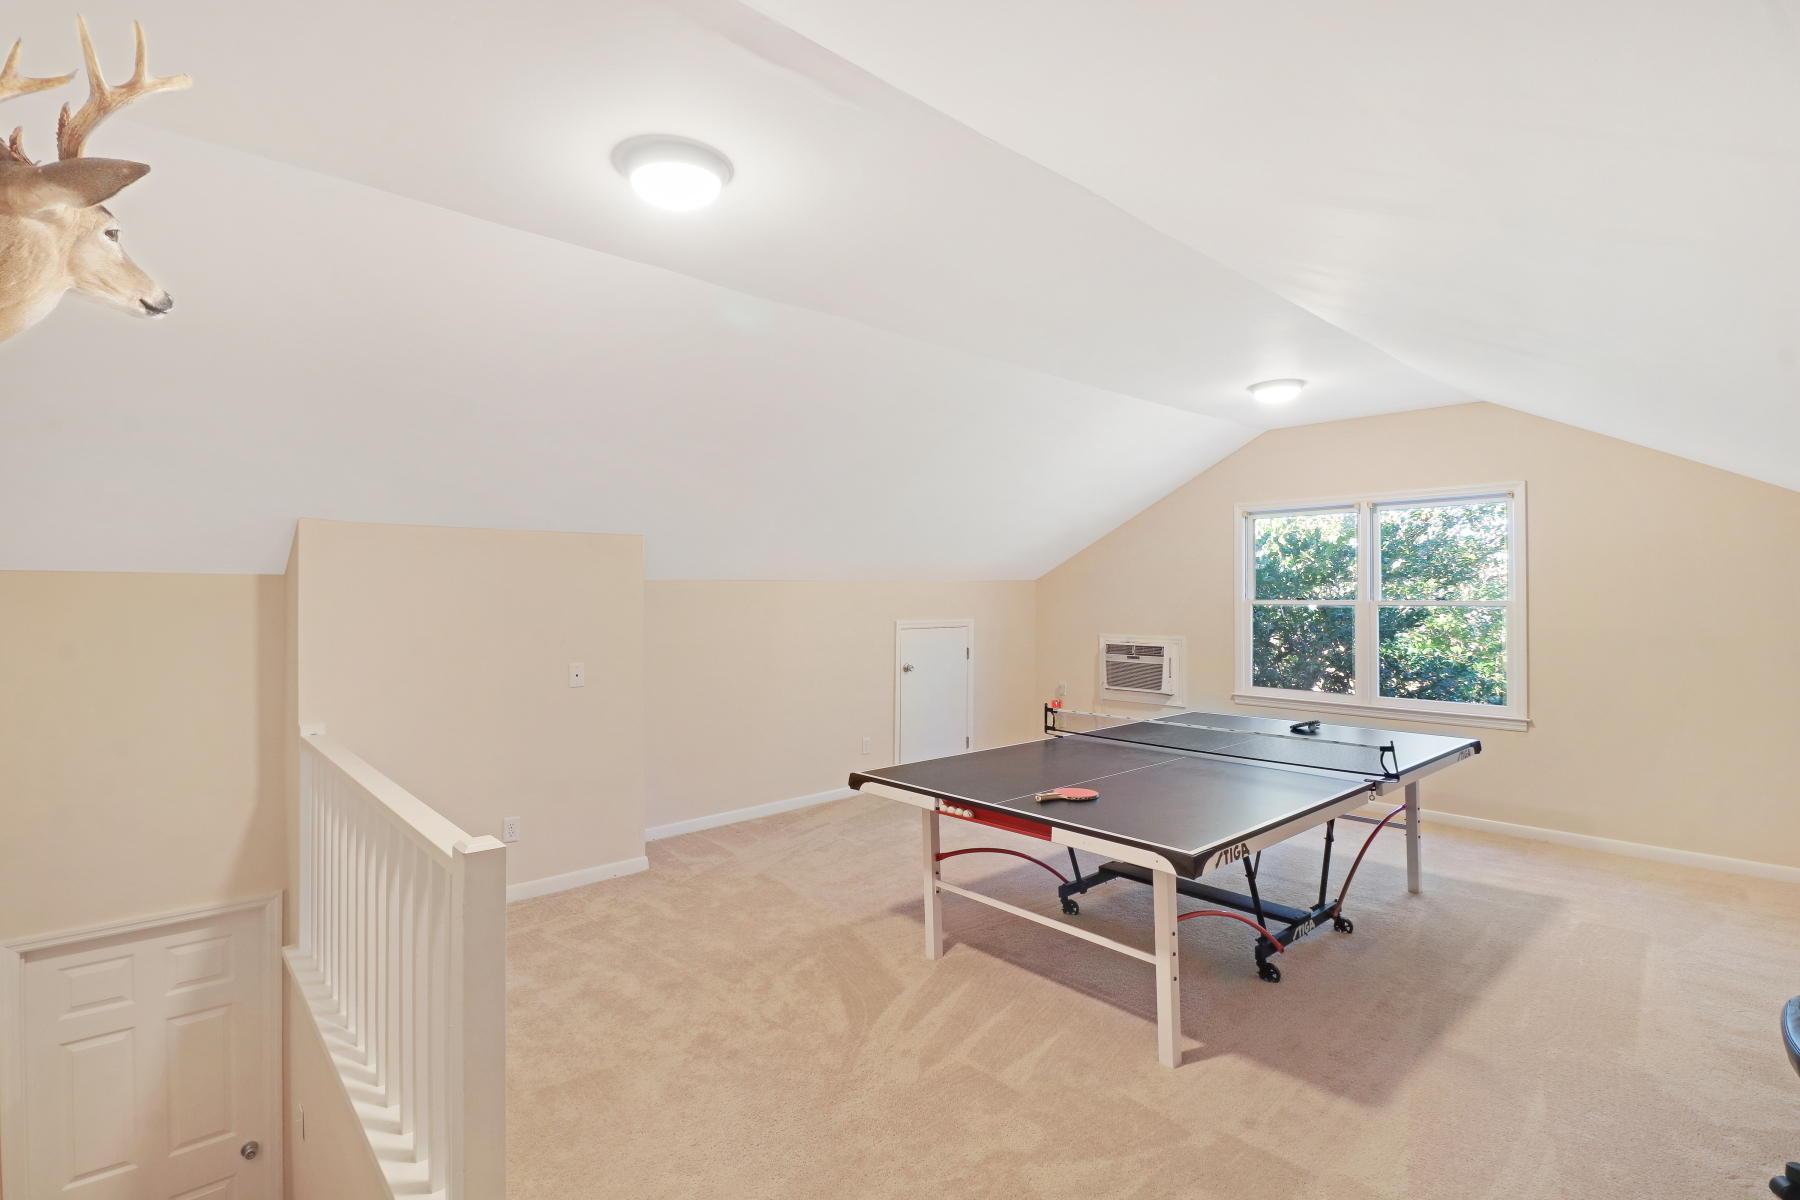 Harrison Acres Homes For Sale - 51 Markfield, Charleston, SC - 22